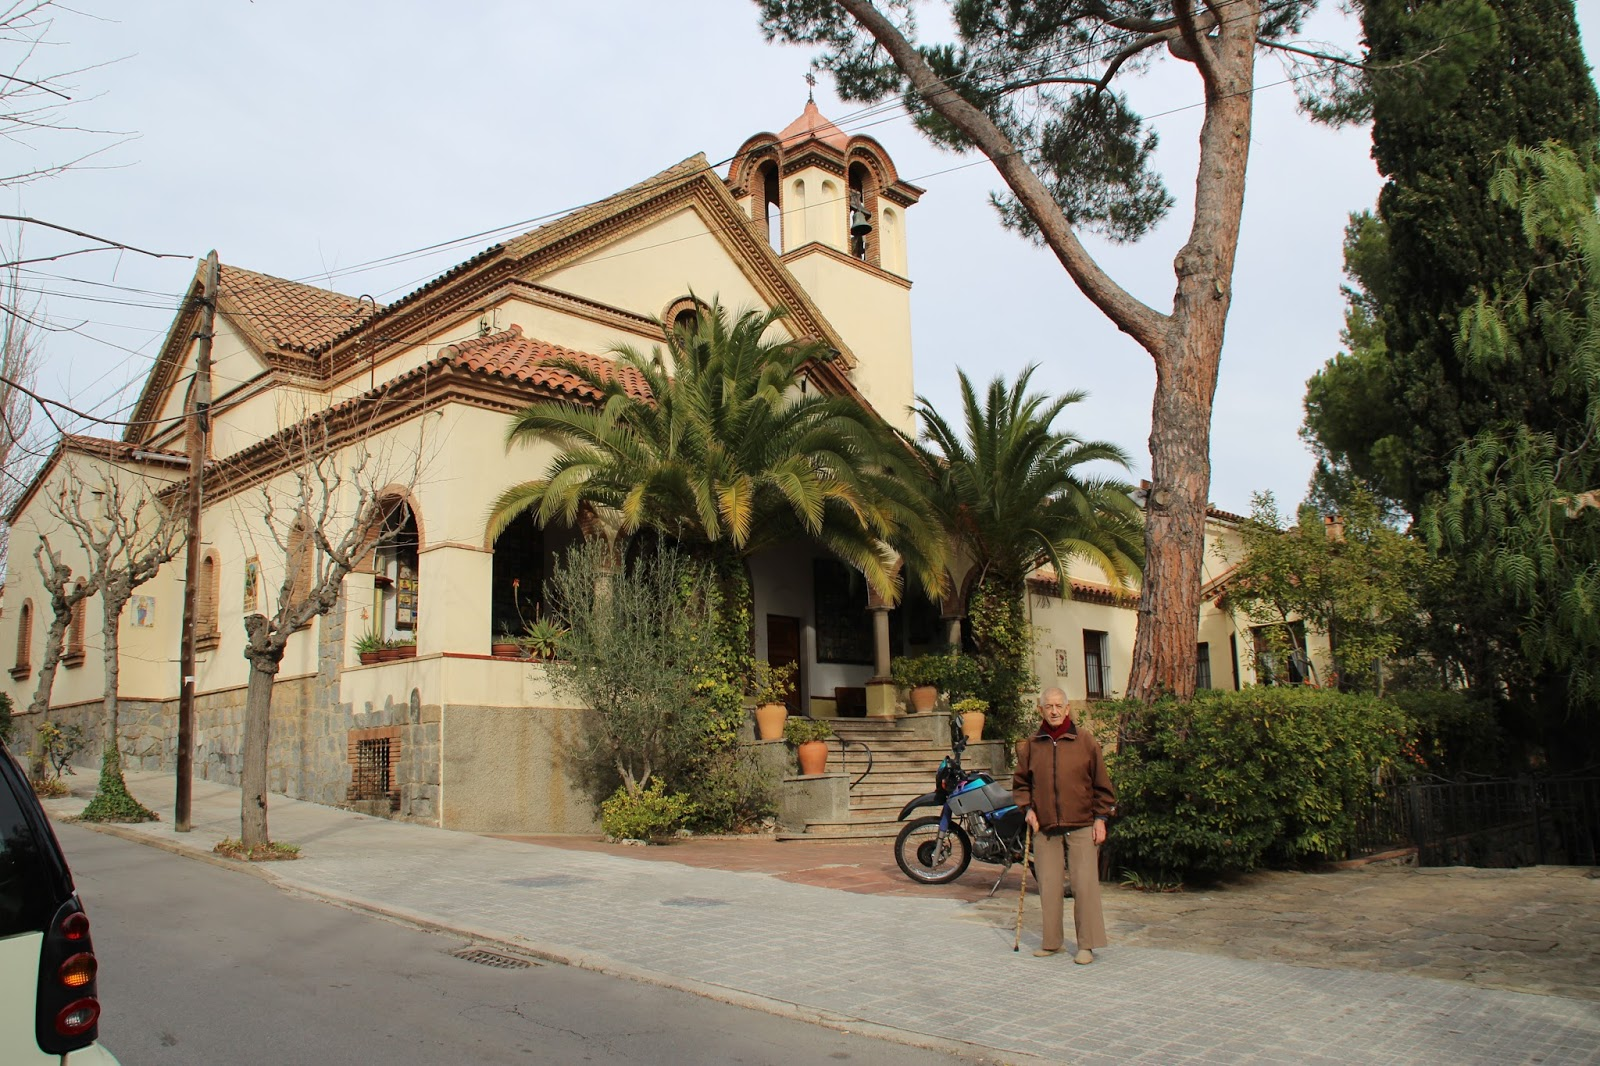 Con ixer catalunya esgl sia de la santa creu bellaterra - Casas en el valles occidental ...